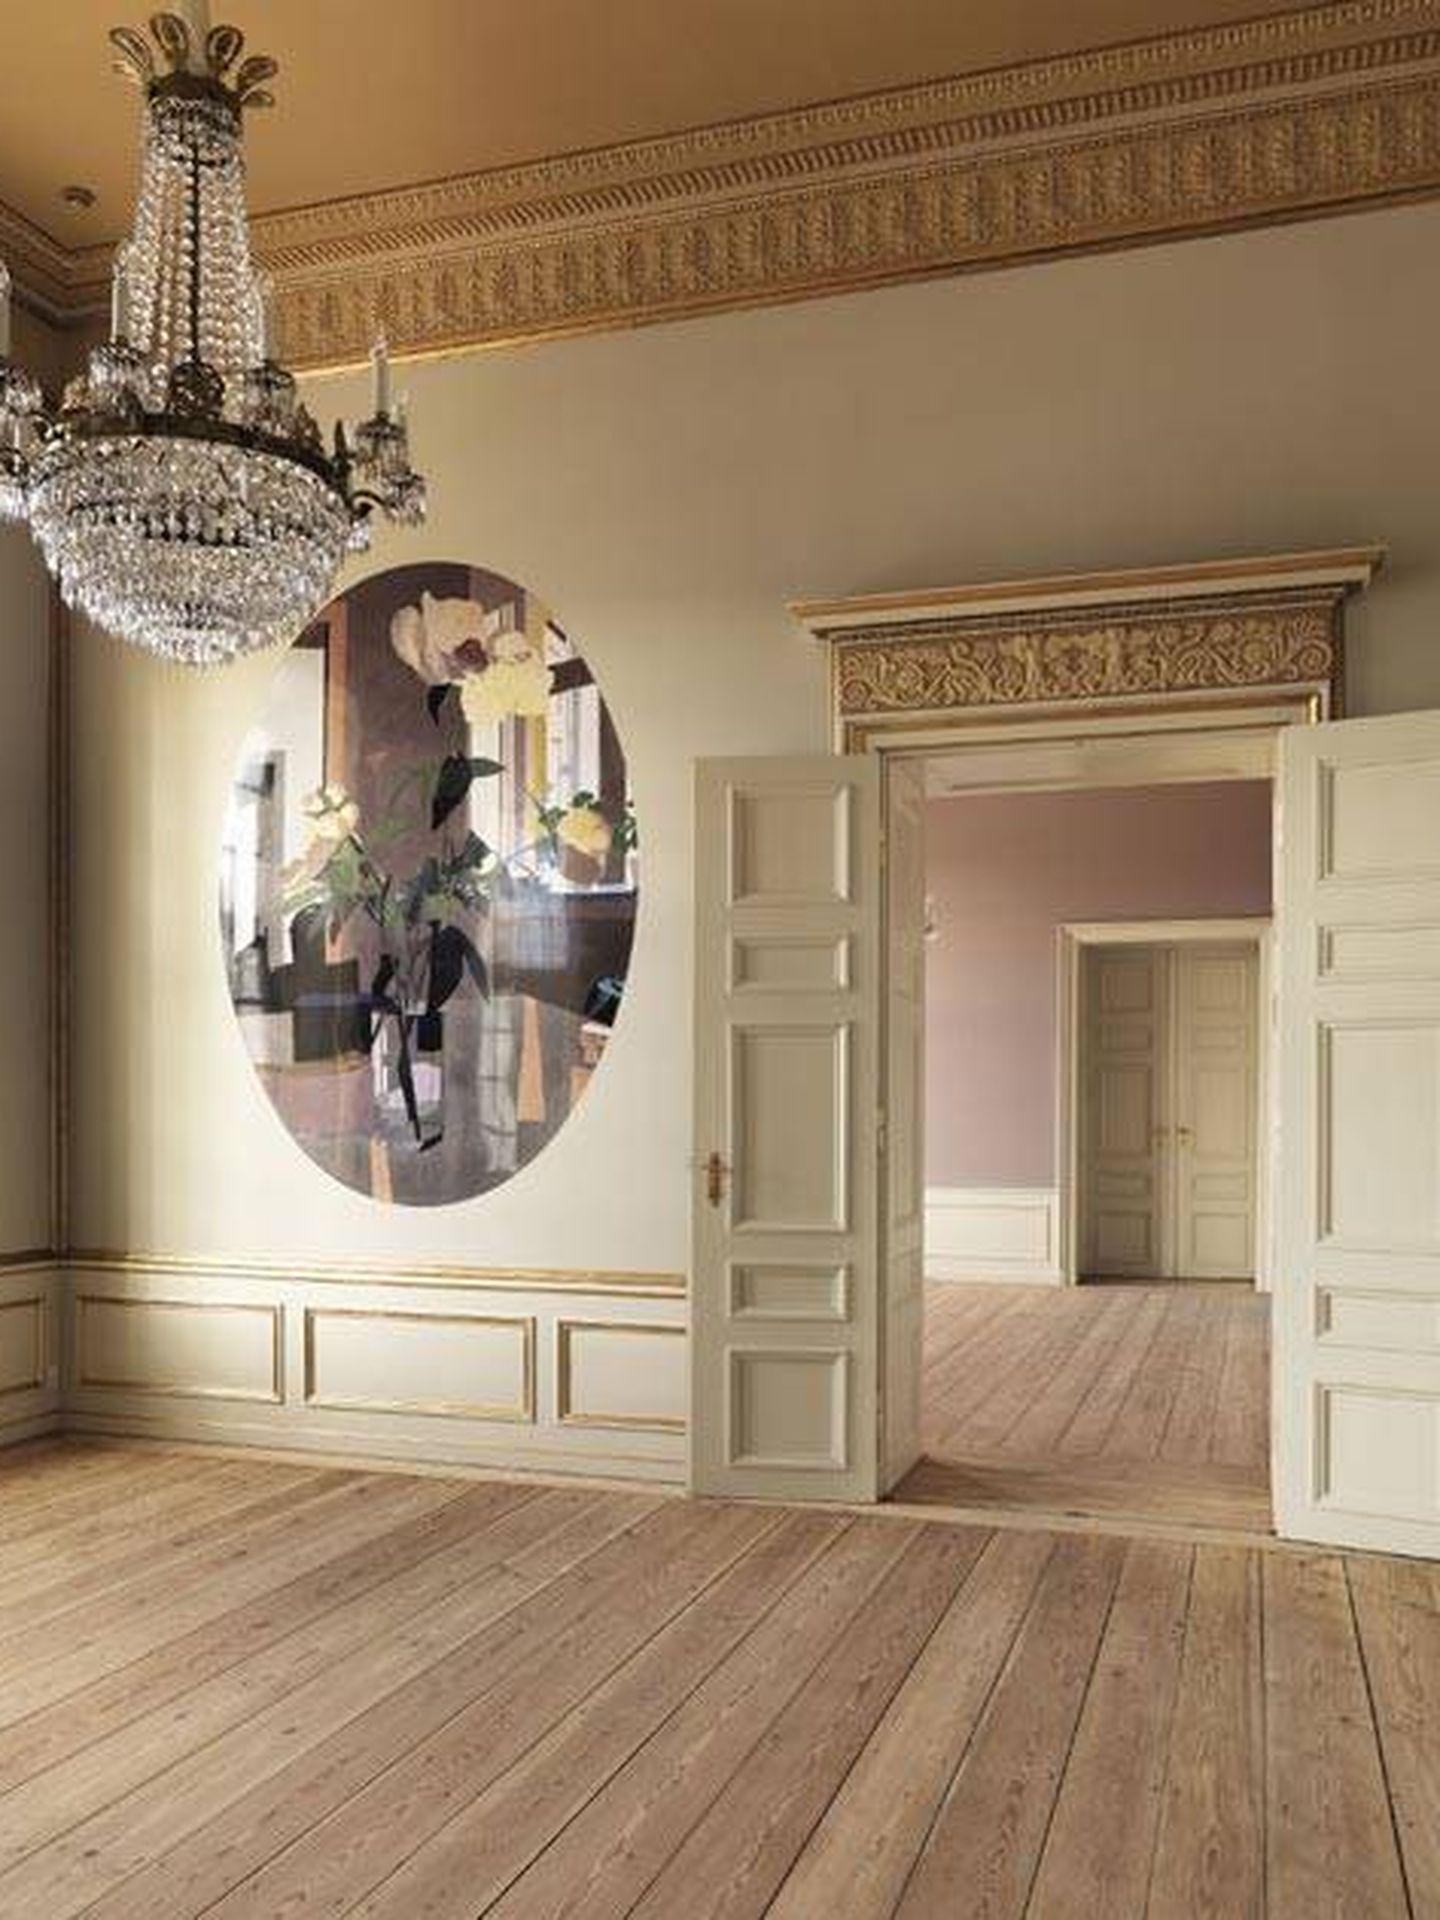 Despacho de la princesa Mary. (Tariq Mikkel Khan/Casa Real)